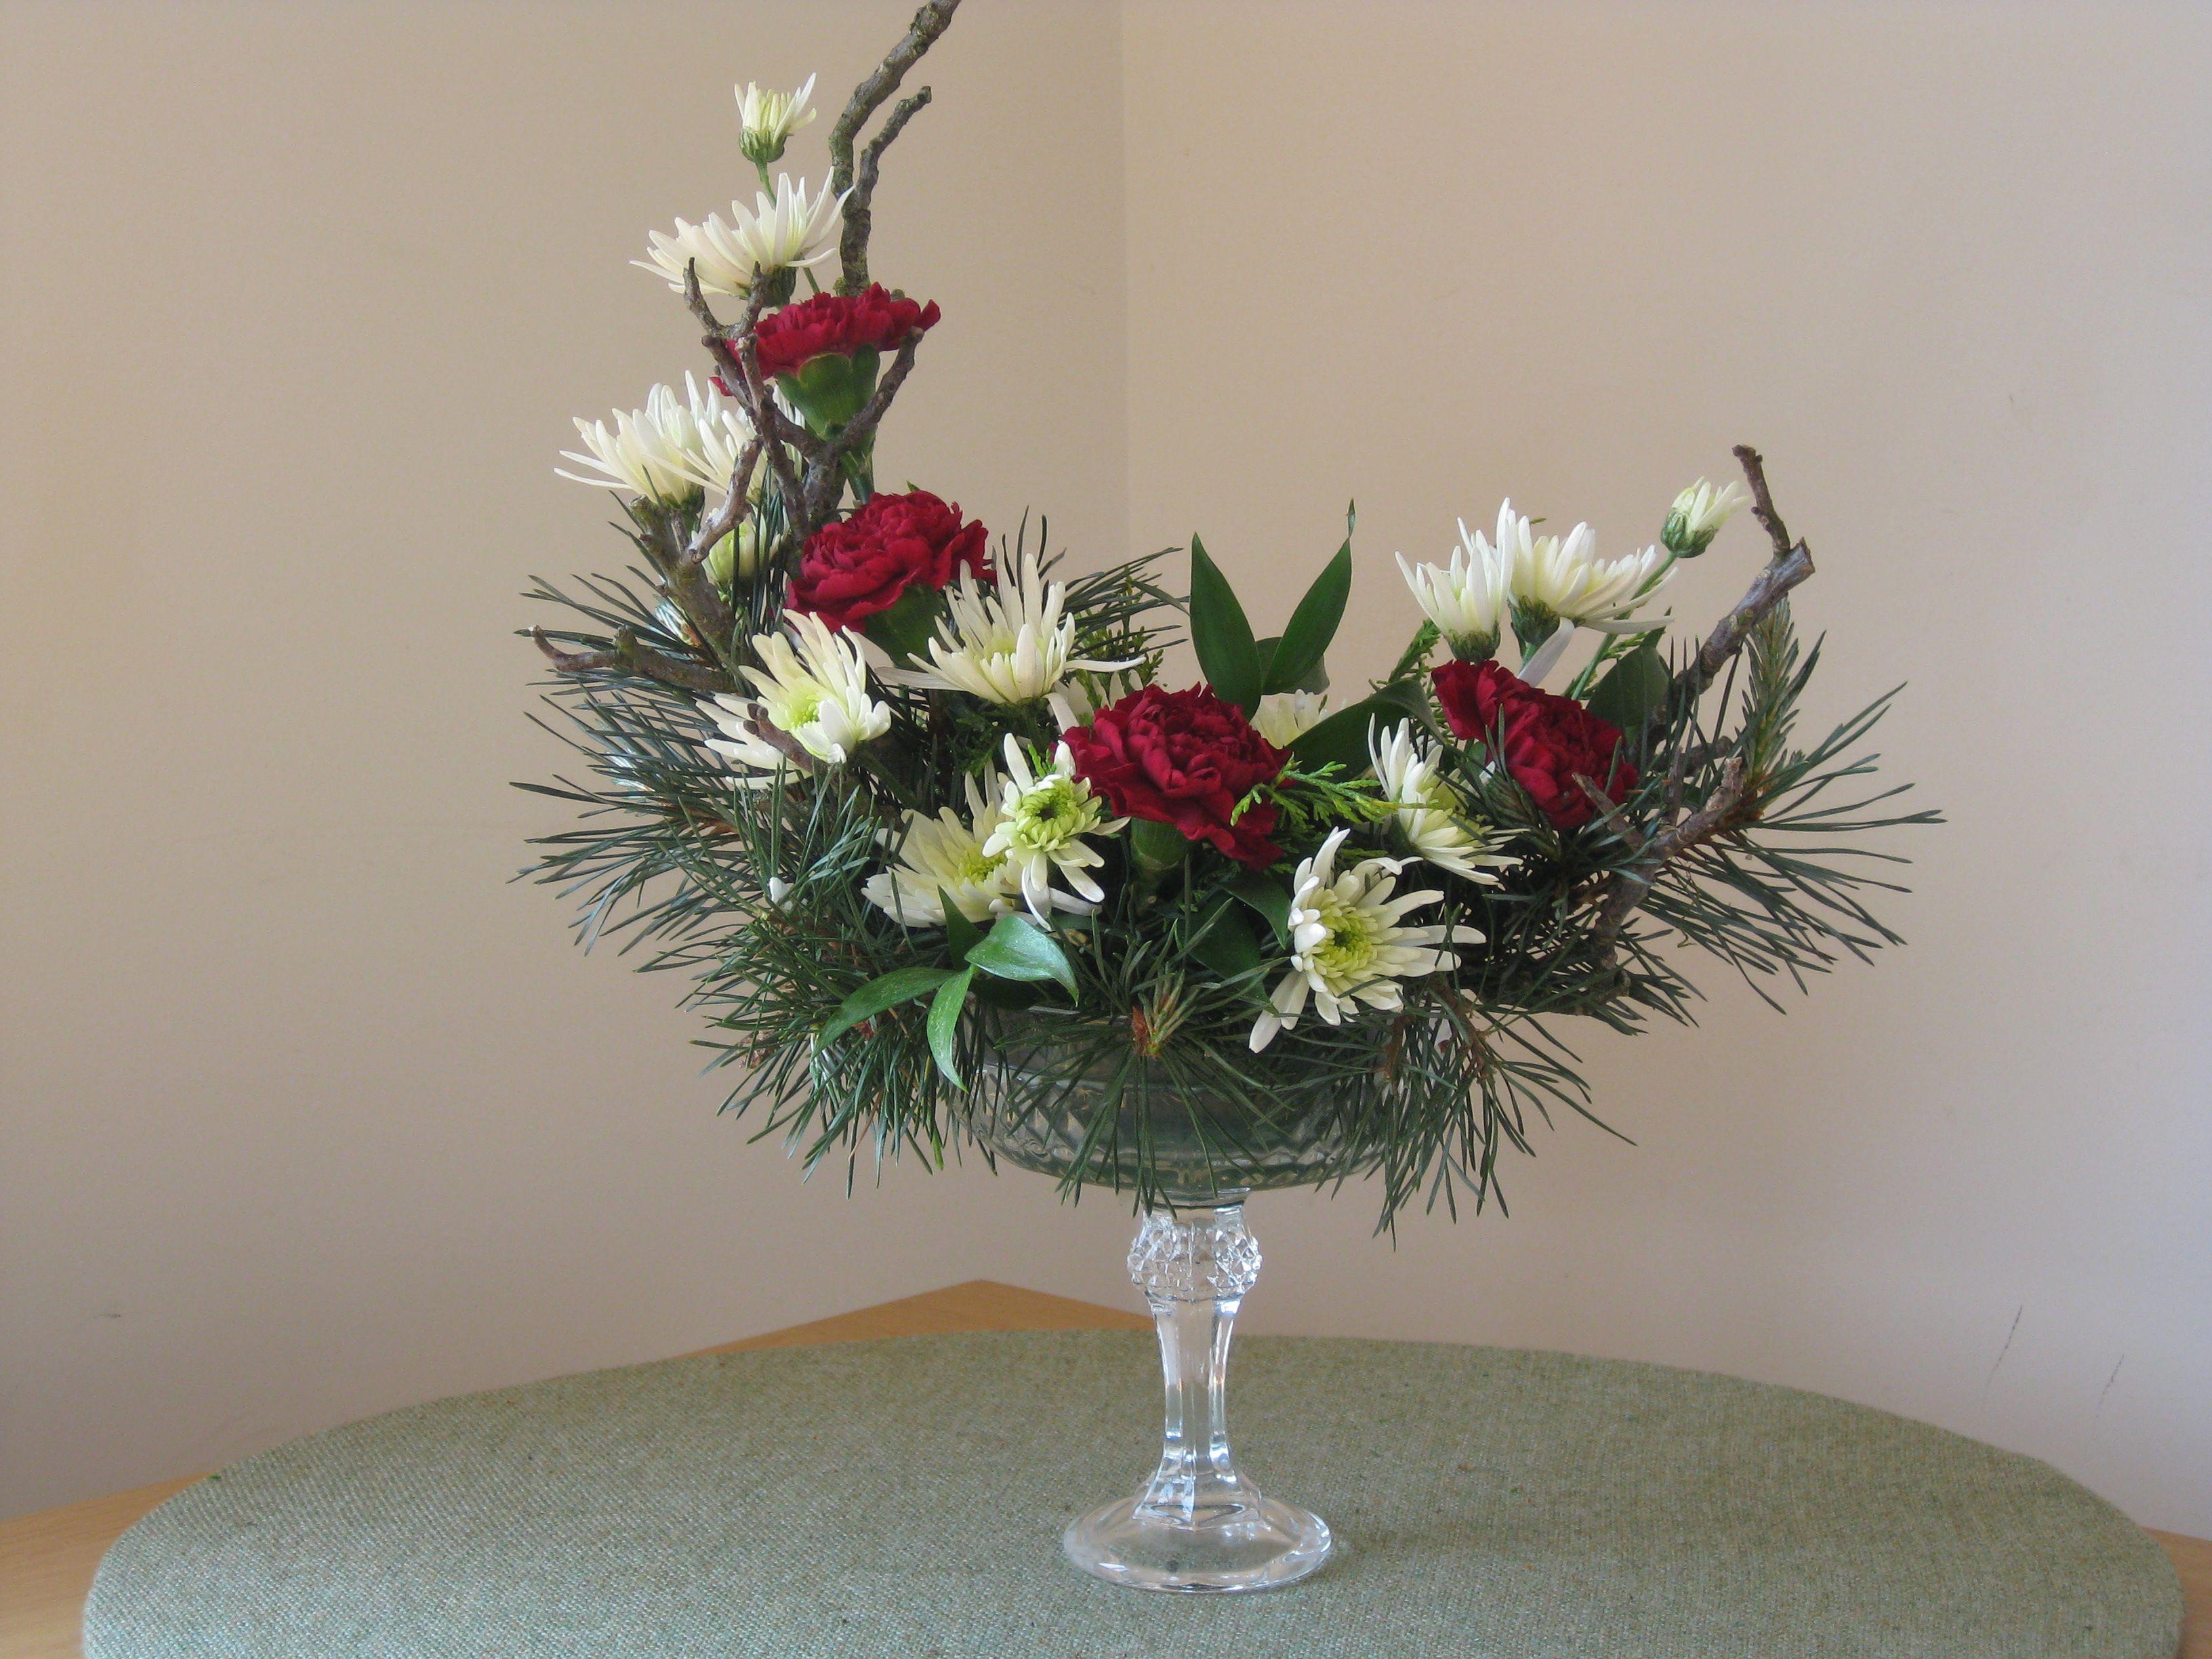 Floral Arrangements Pictures large wedding pedestal flower arrangement | large floral